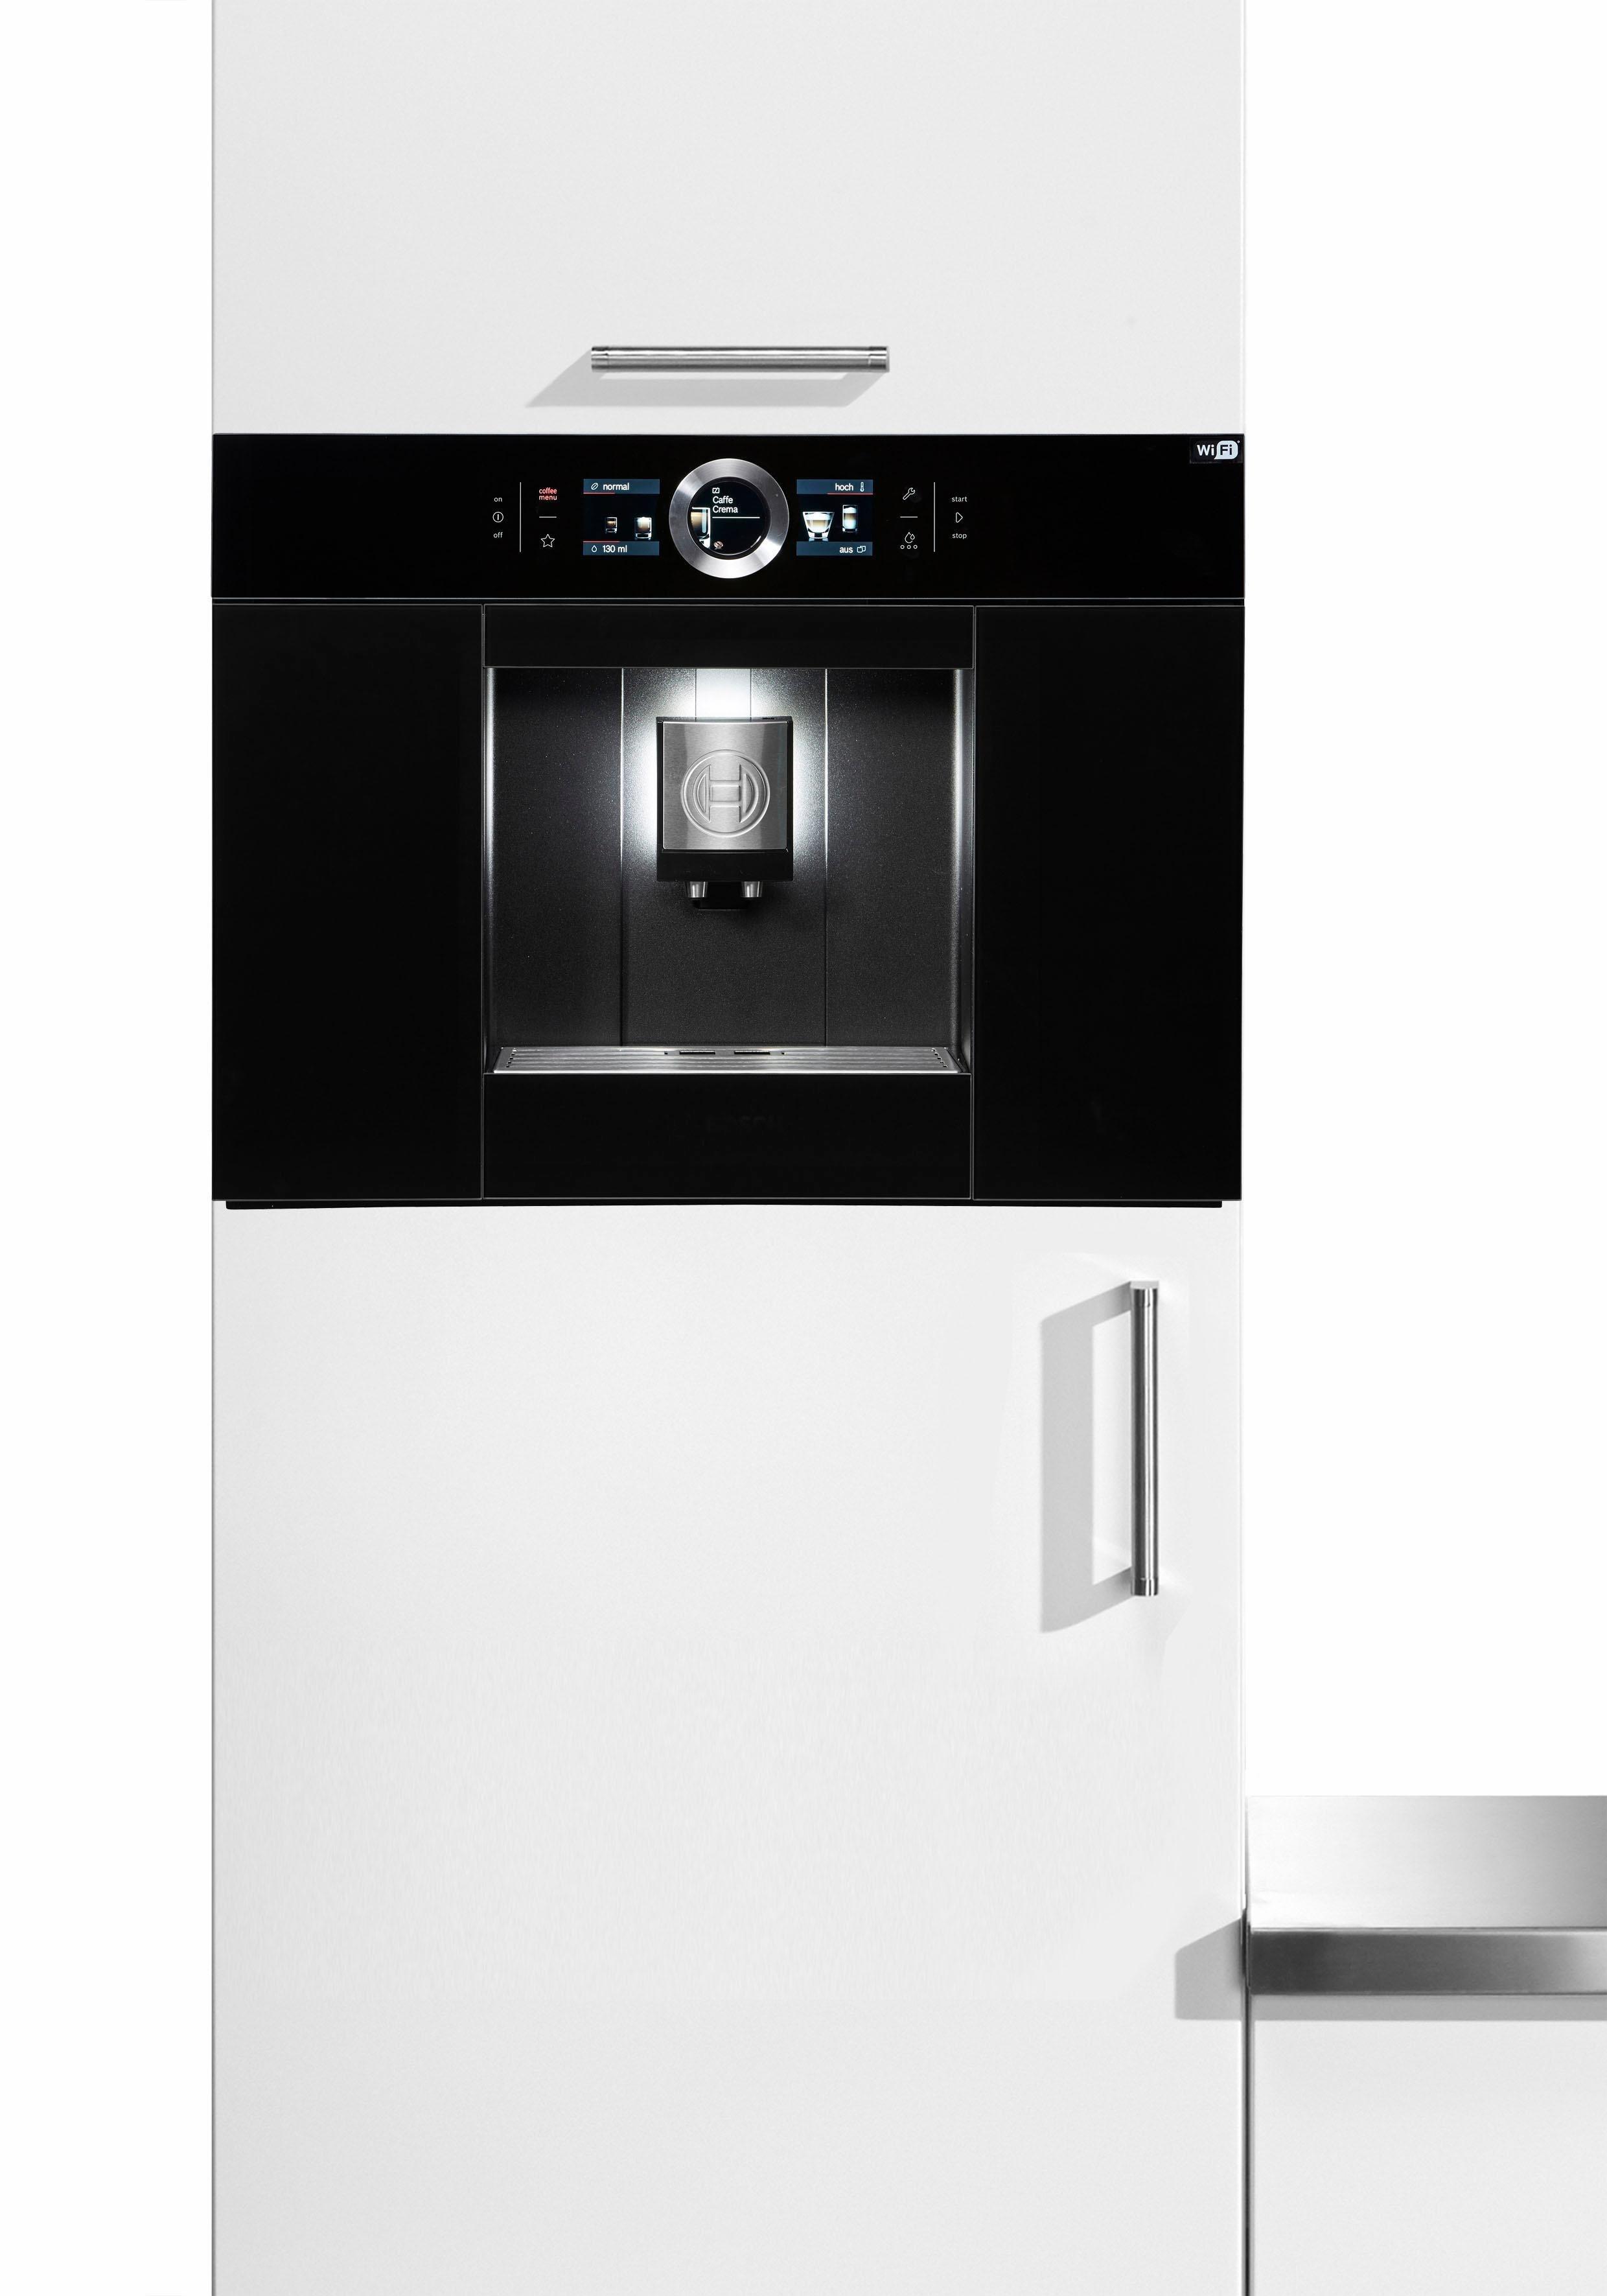 41 sparen bosch einbau kaffeevollautomat ctl636eb6. Black Bedroom Furniture Sets. Home Design Ideas